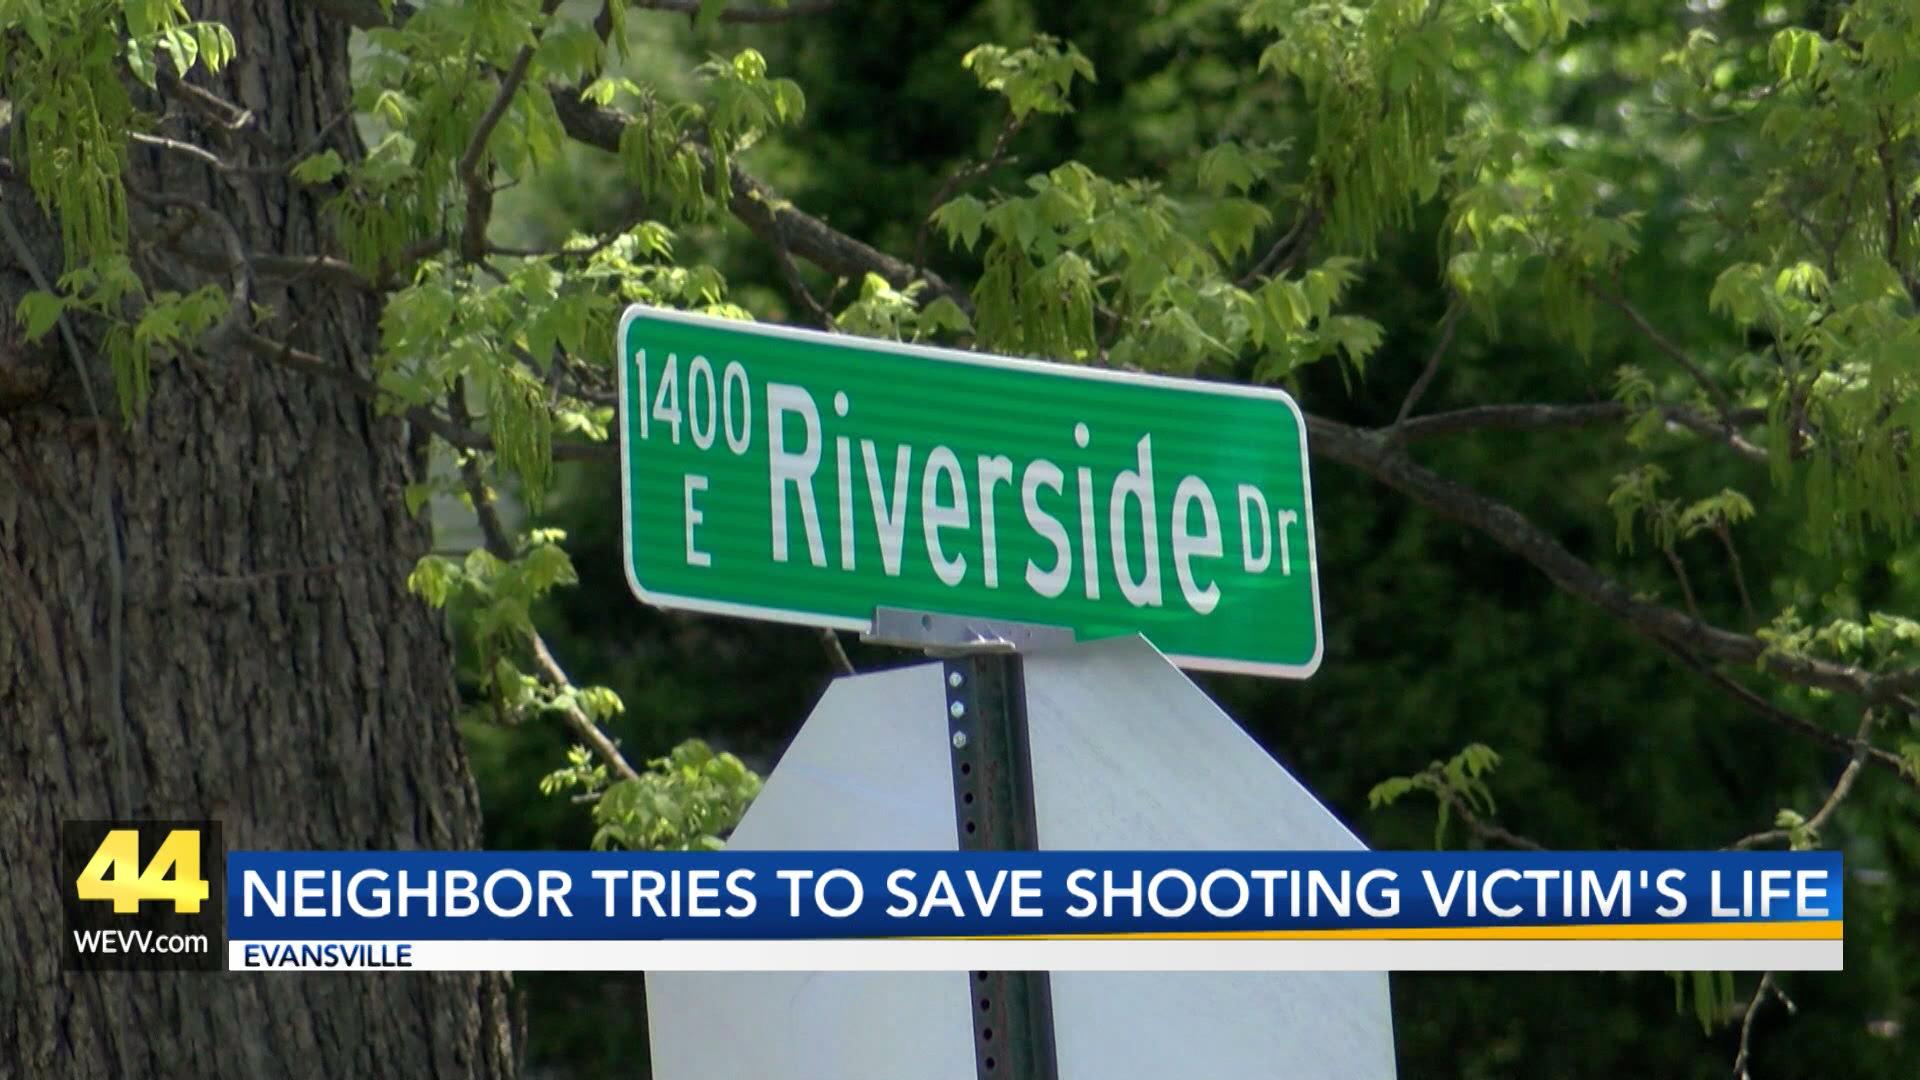 Image for Neighbor Tries To Save Shooting Victim's LIfe